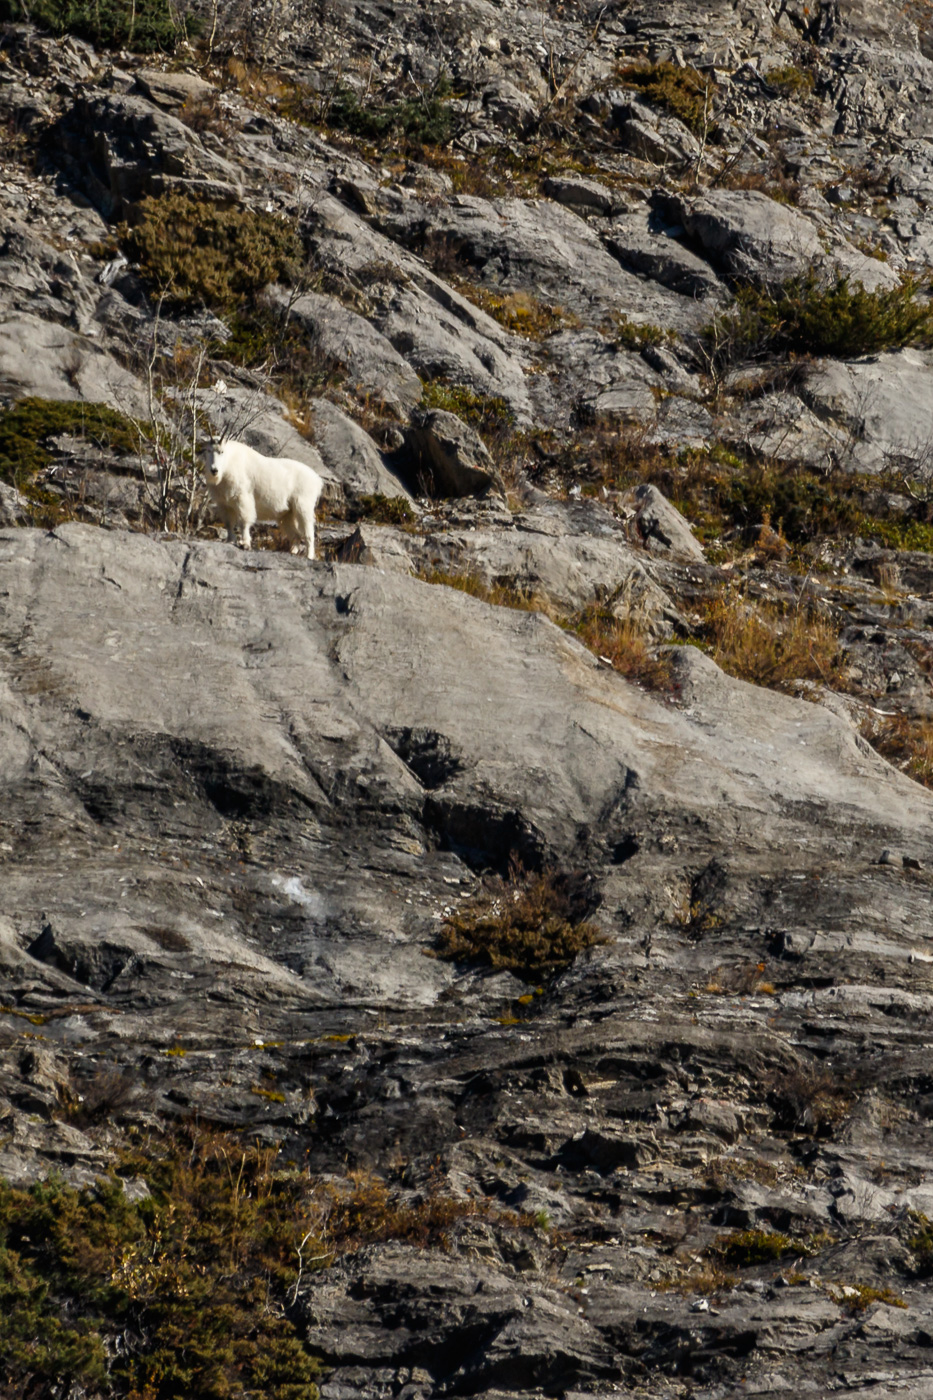 Mountain Goat (Oreamnos americanus), Alberta, Canada. - Fauna de Nord-Amèrica - Raül Carmona - Fotografia, Fotografia d'estudi, esdeveniments i Natura